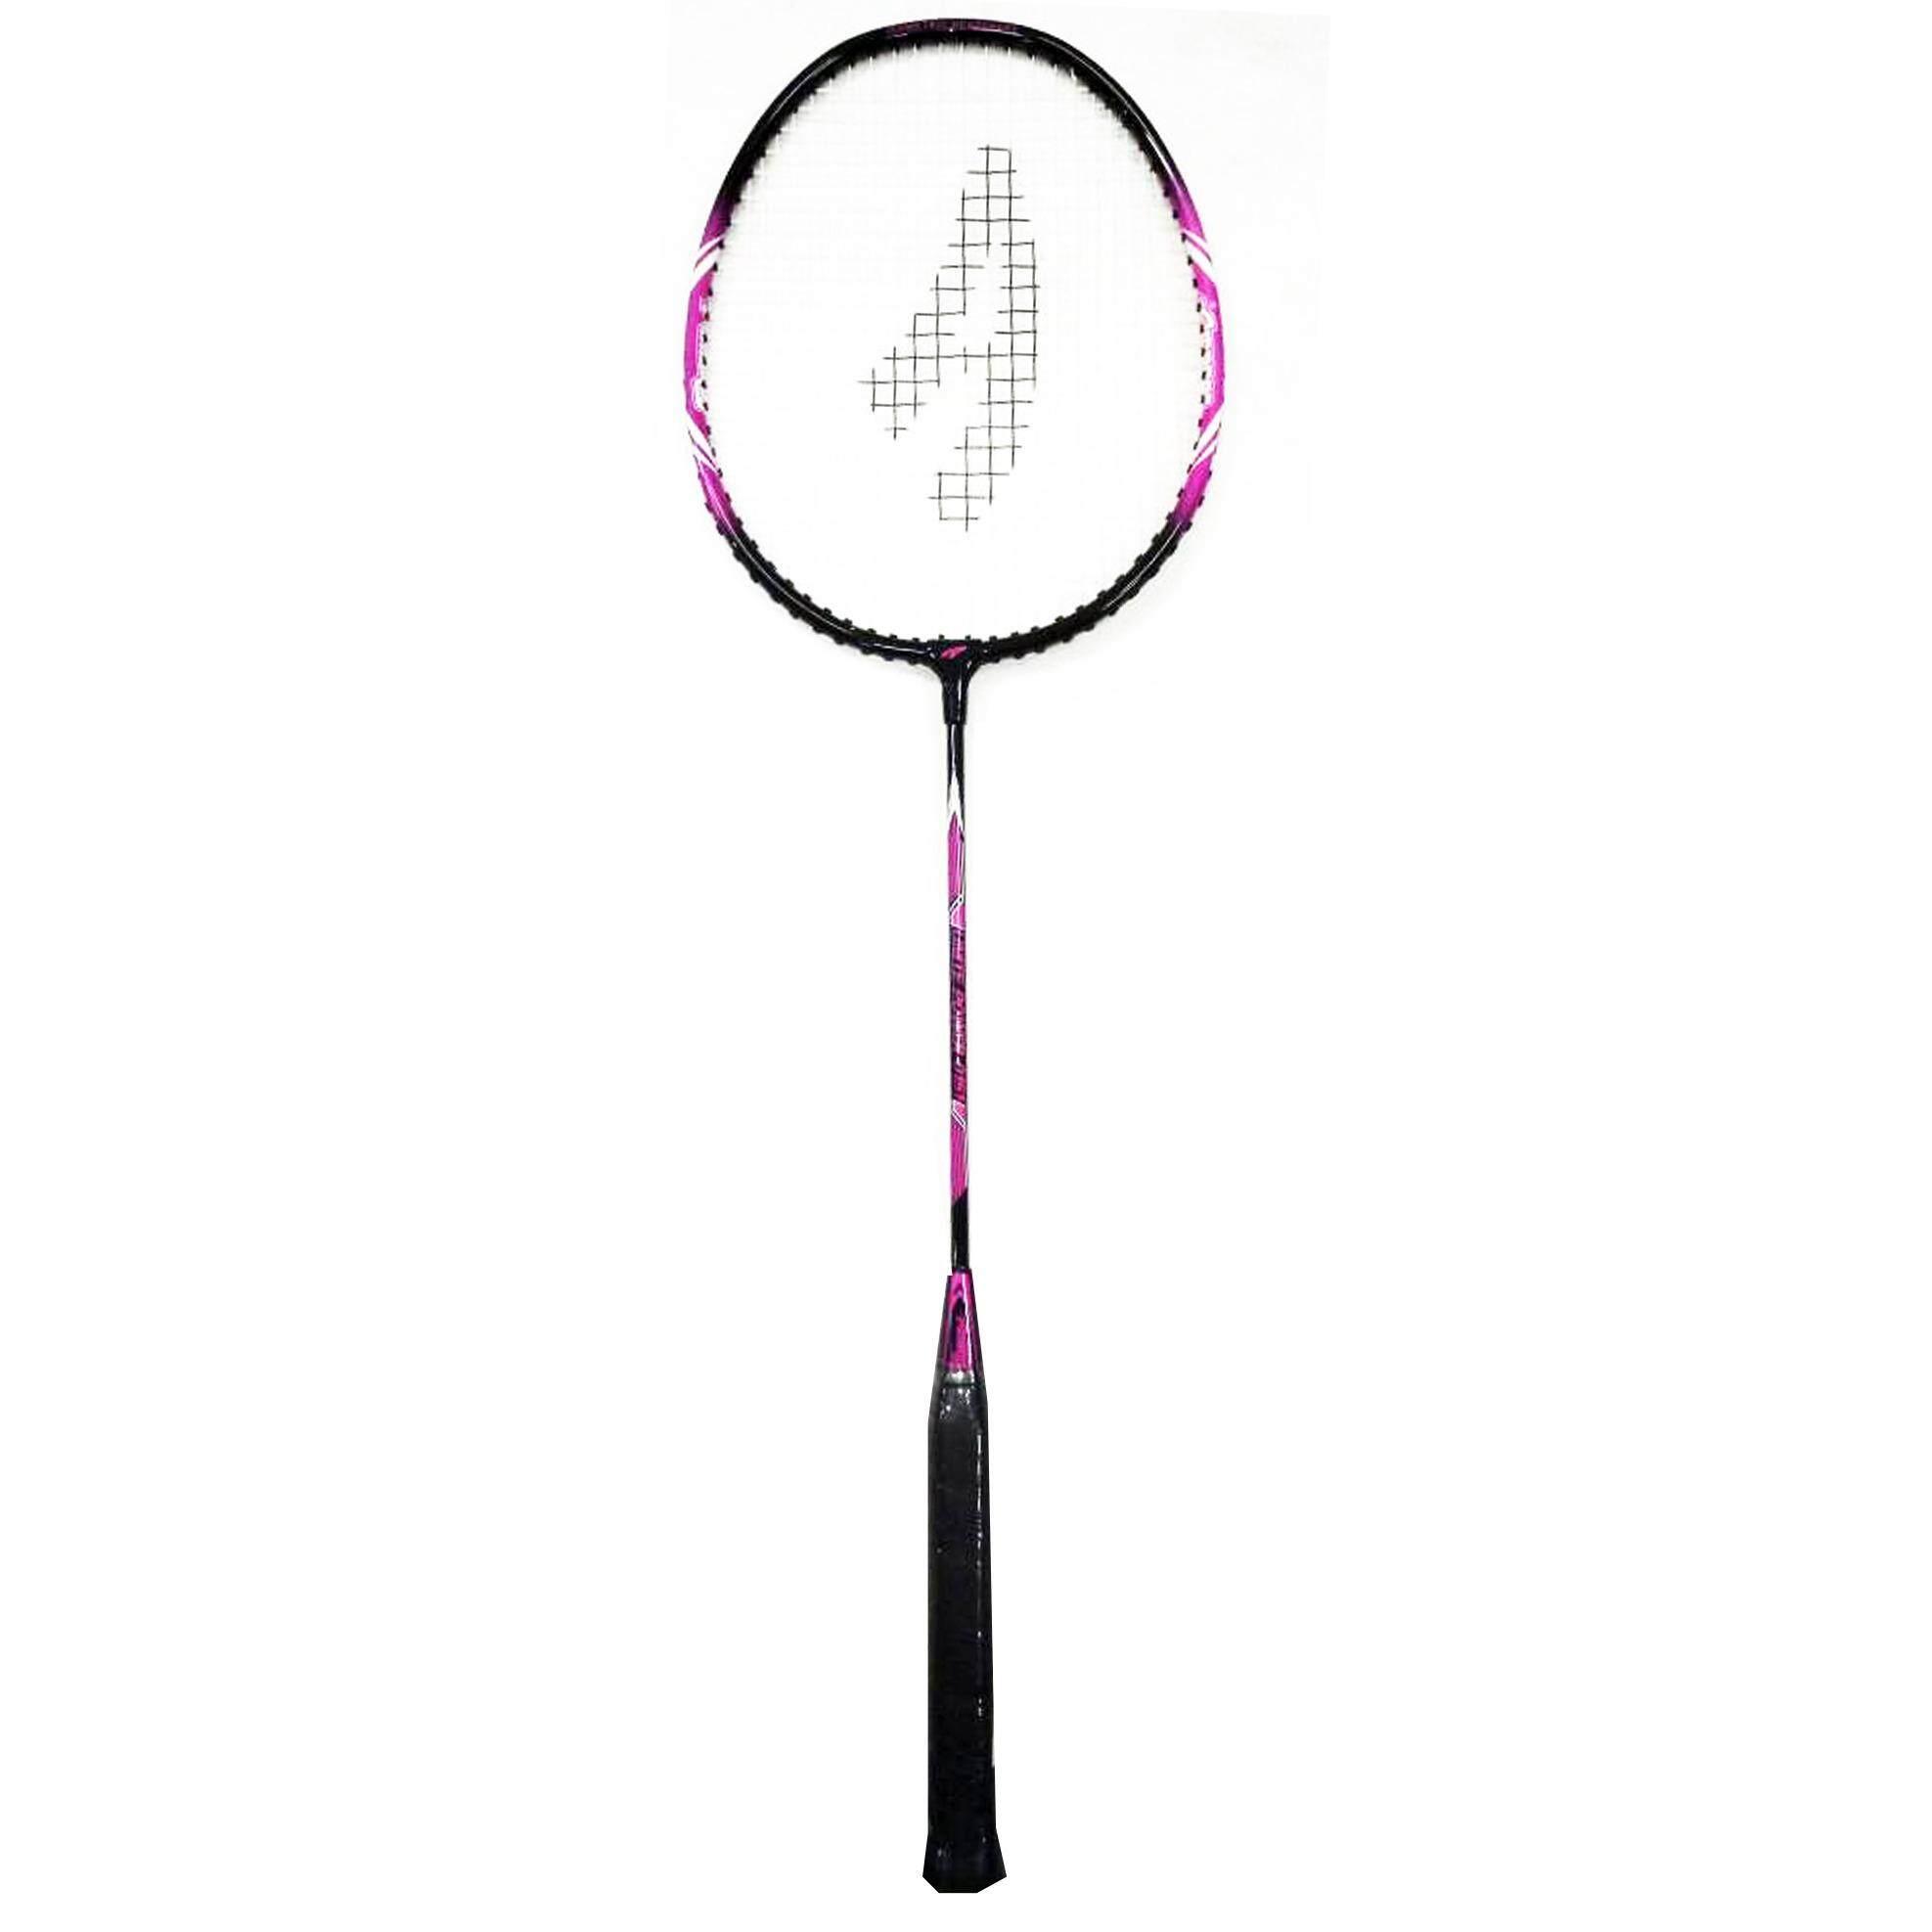 Ambros Unite Power T-Joint Badminton Racket - Black/Purple